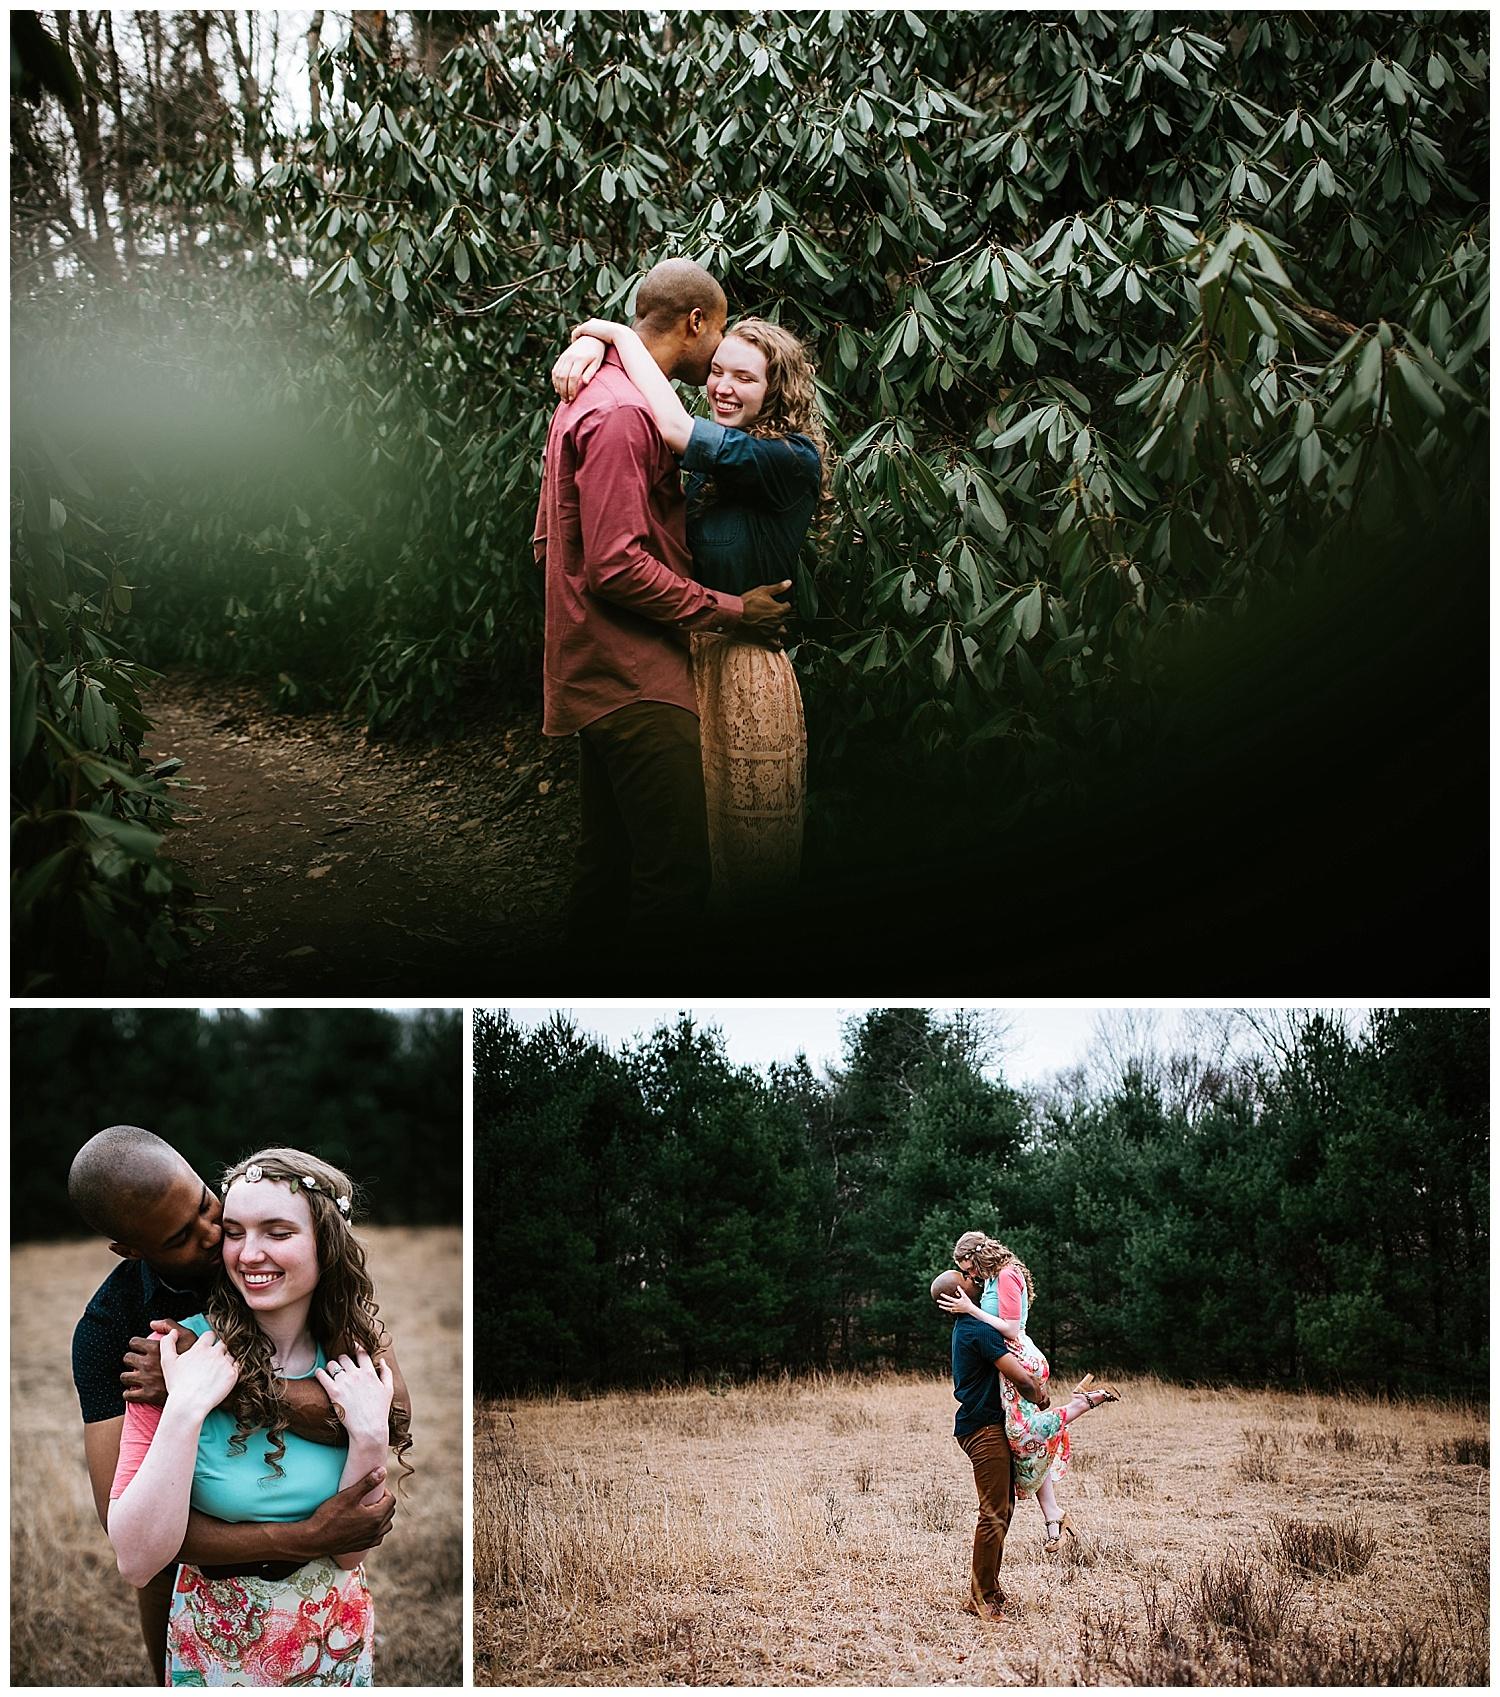 NEPA-Wedding-Engagement-Photographer-Hickory-Run-Hawk-Falls-Whitehaven-PA_0092.jpg